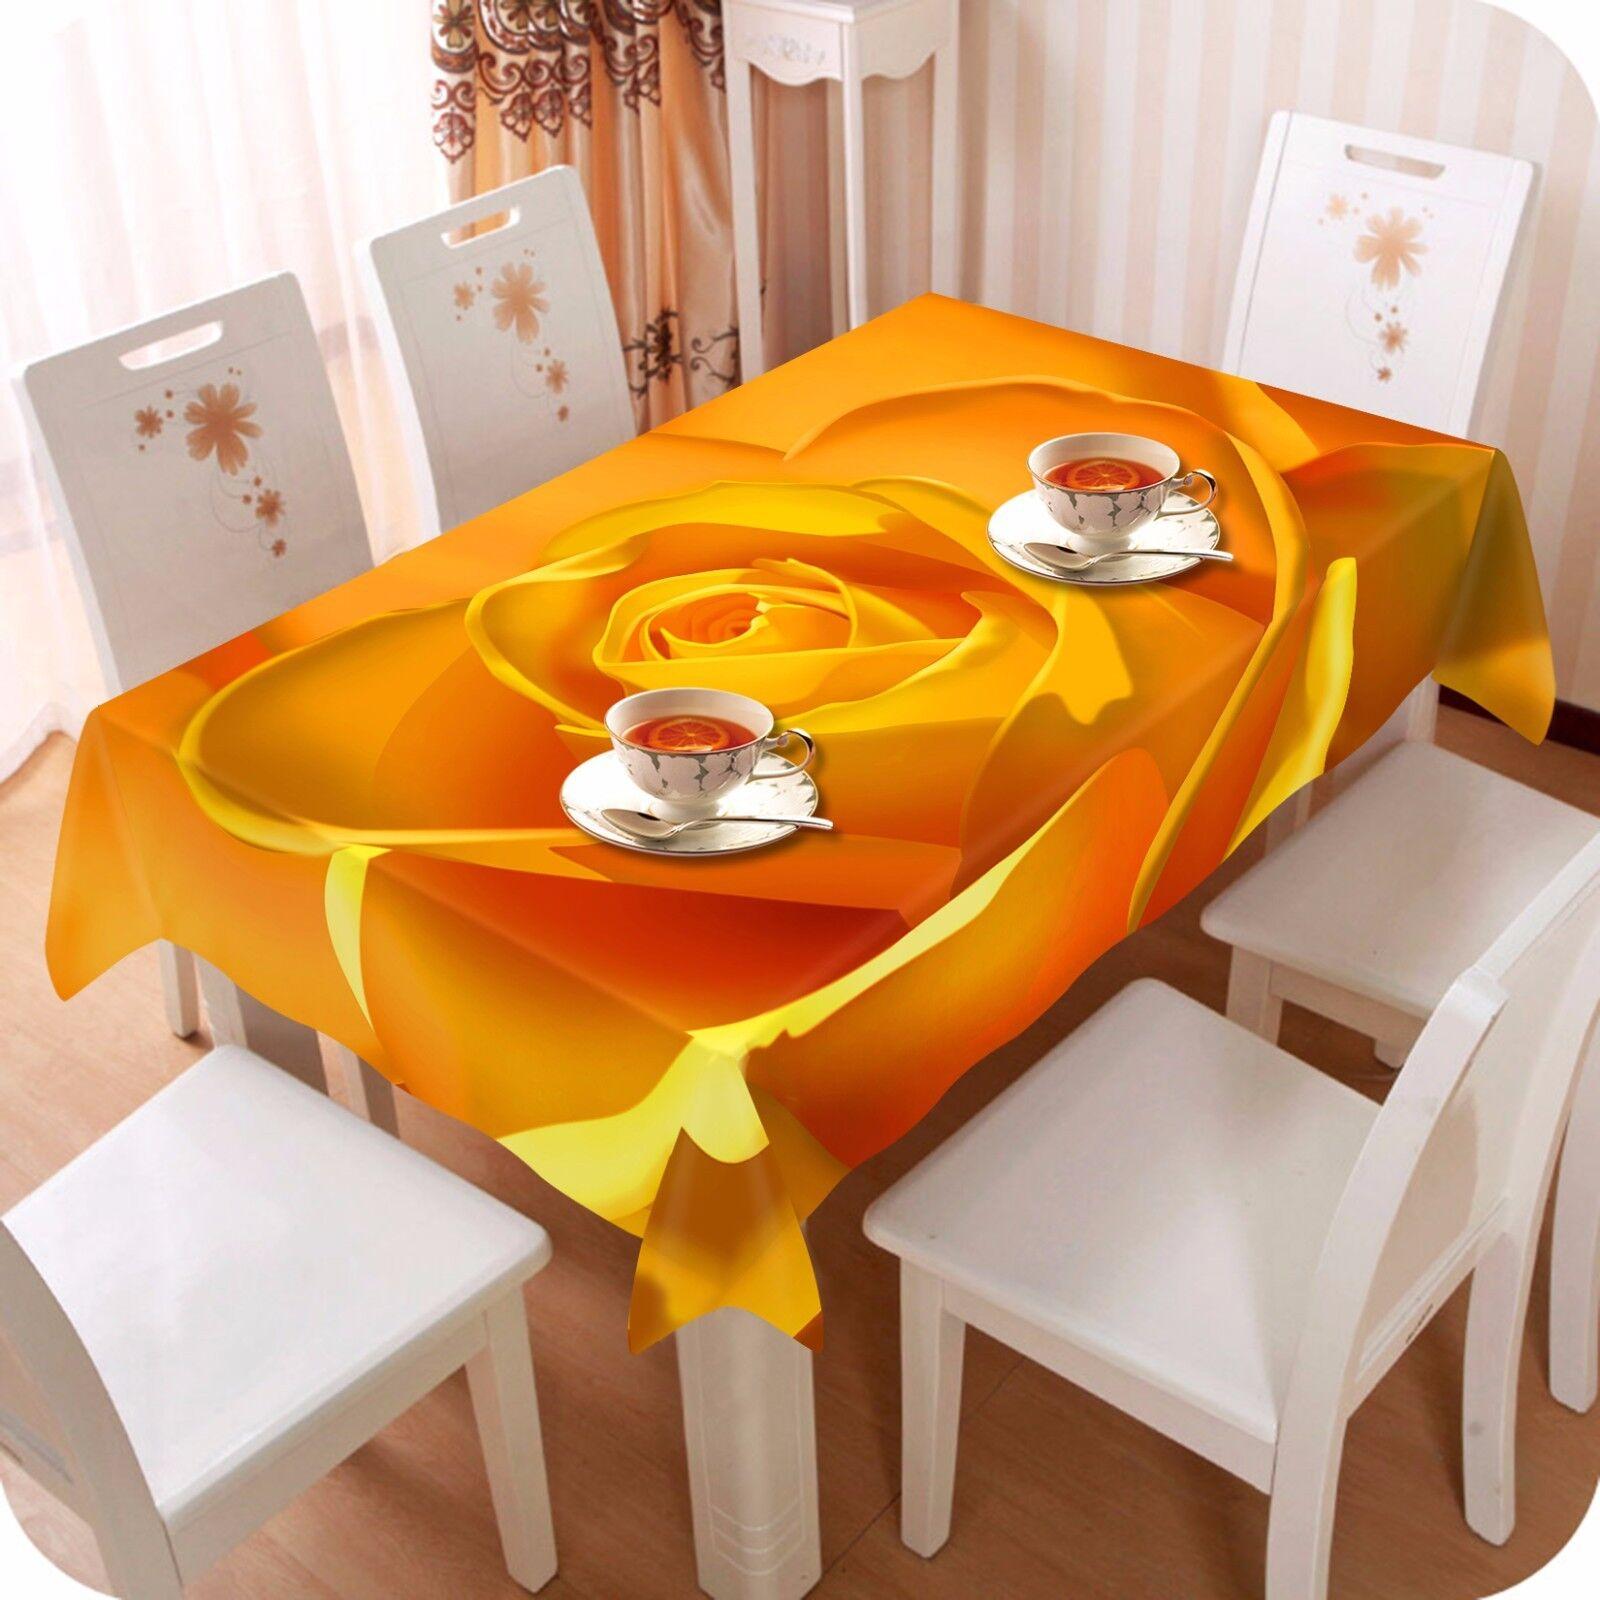 3D Yellow Tablecloth Table Cover Cloth Birthday Party AJ WALLPAPER UK Lemon